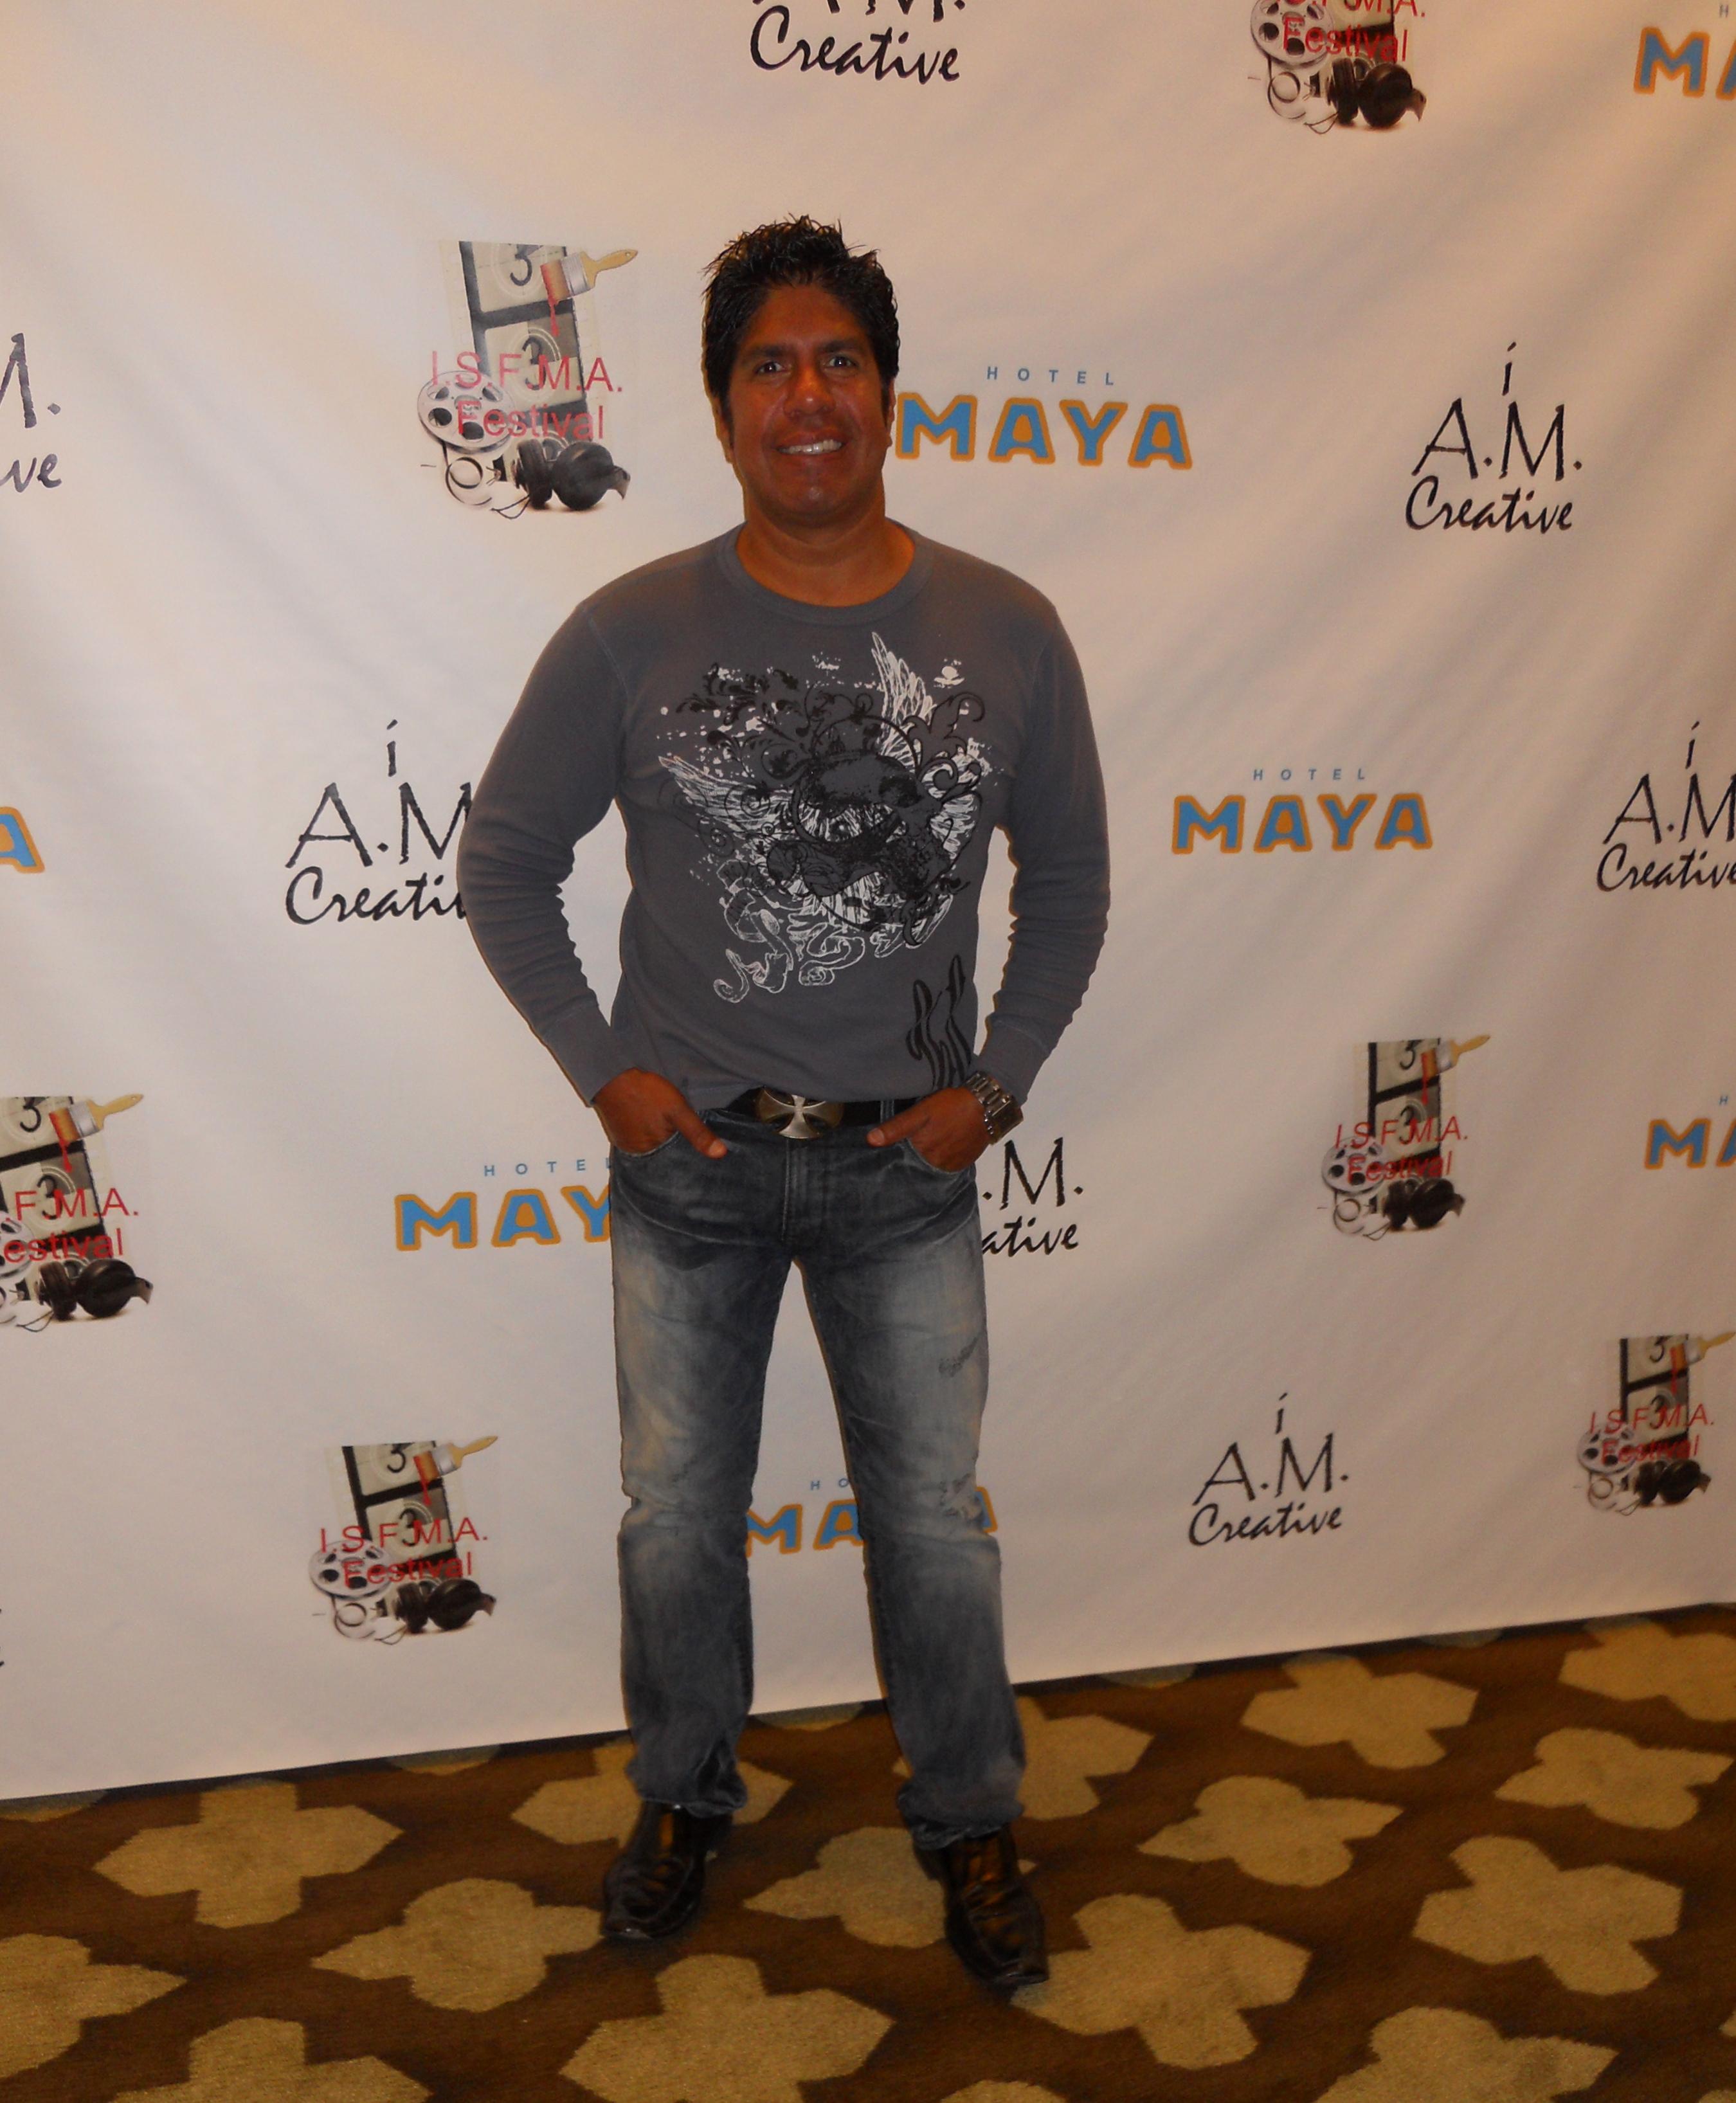 Gordon Vasquez, IFSMA Festival - First Test Screening of